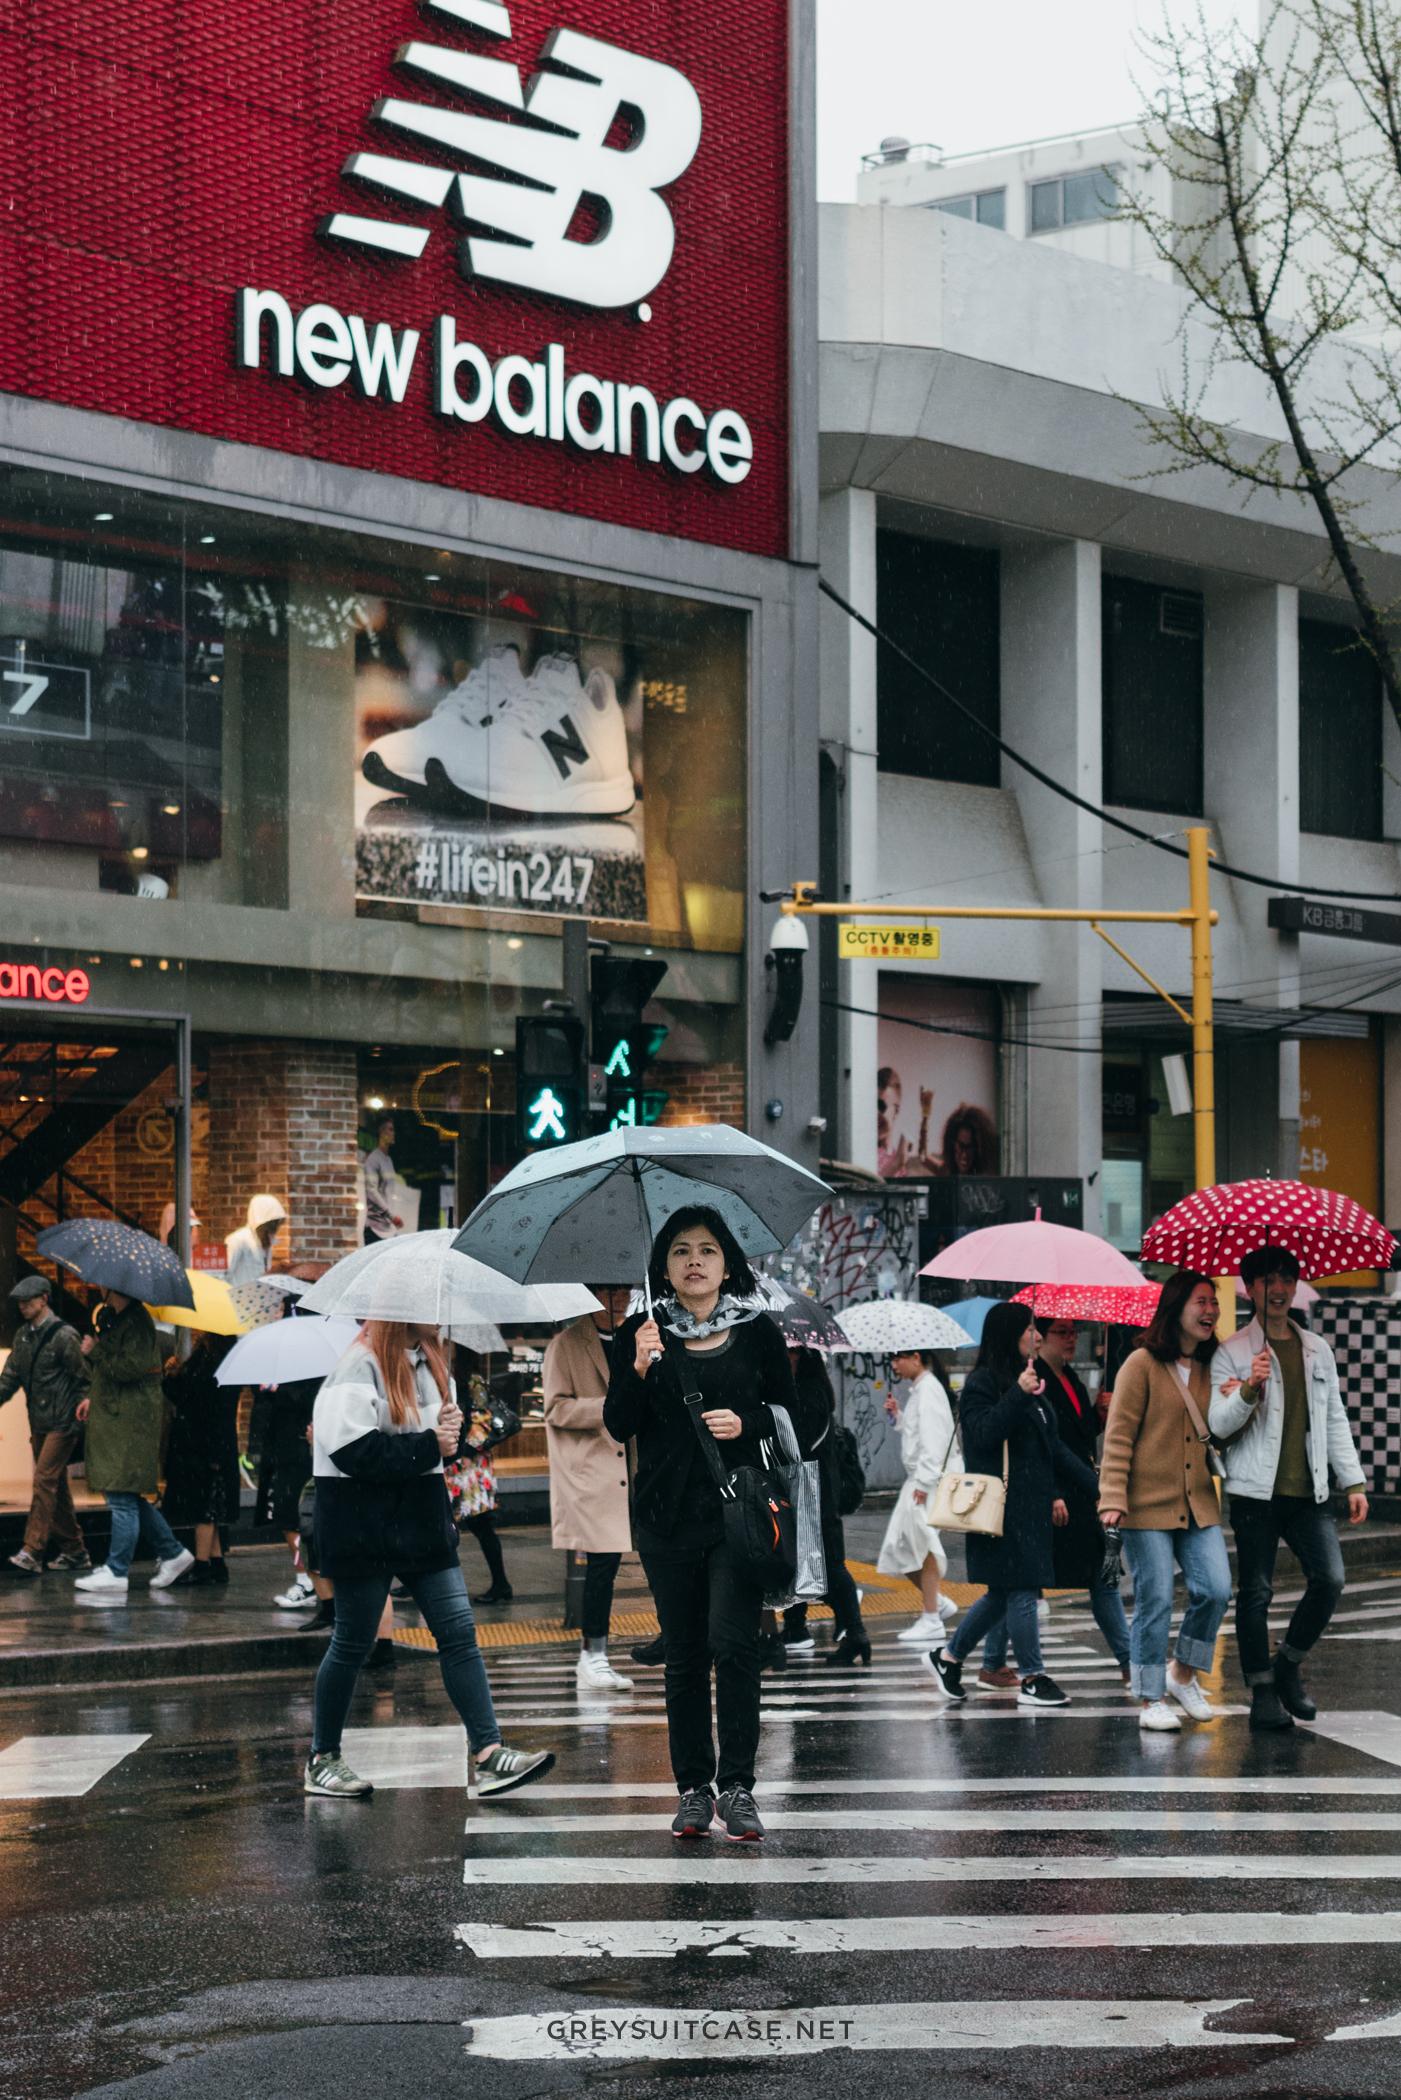 Greysuitcase Travel Series - Seoul Spring '17 - Rainy Day in Hongdae (홍대), Seoul, South Korea